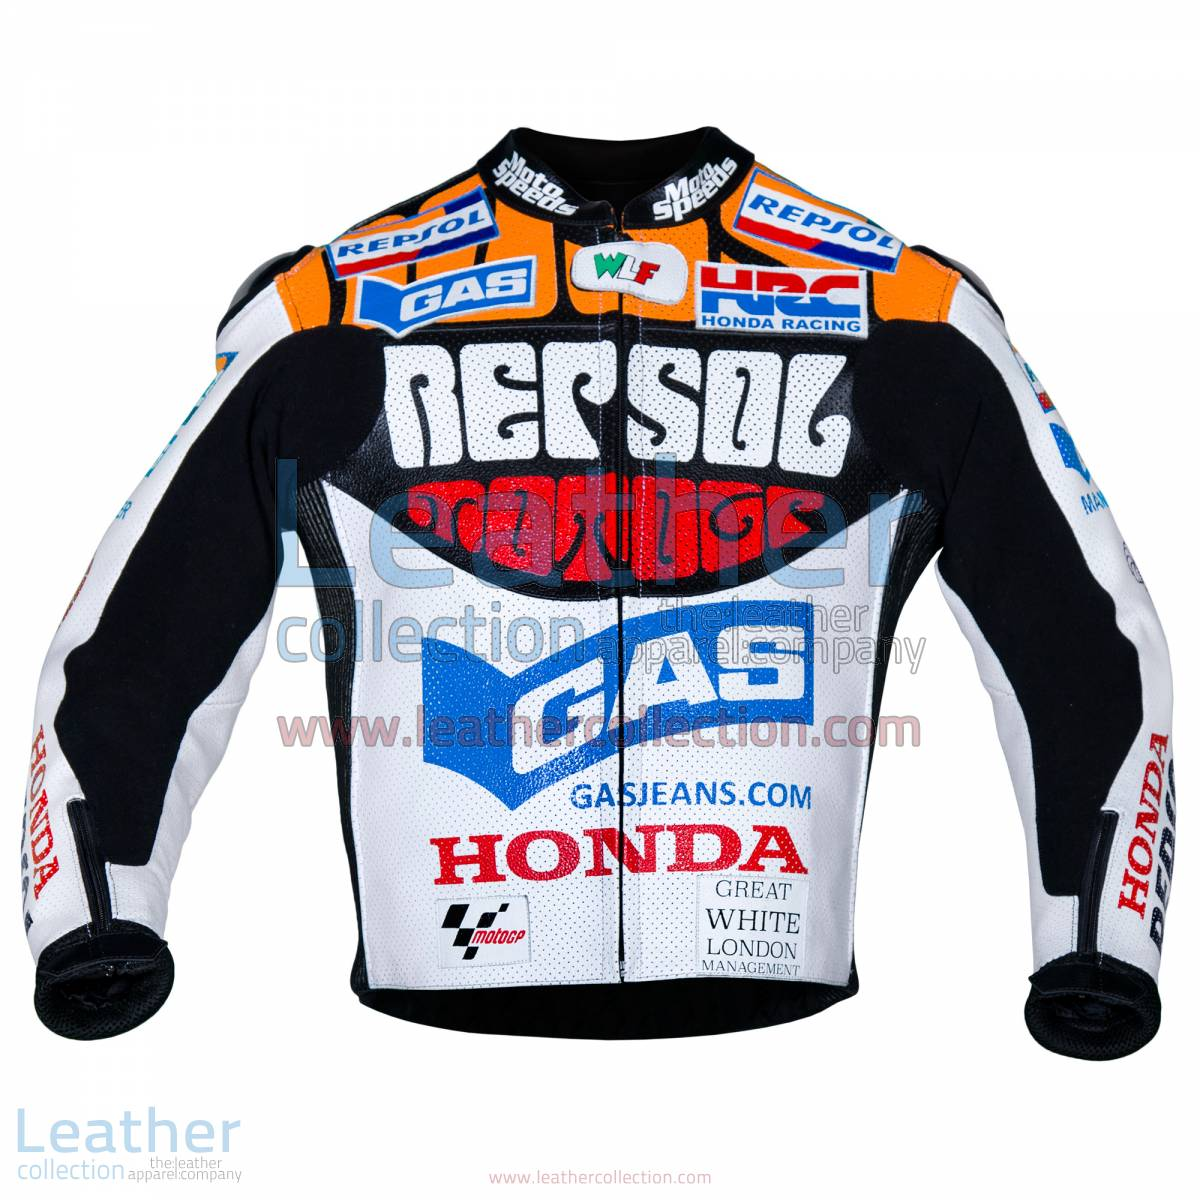 Valentino Rossi Motociclismo Repsol Honda MotoGP 2003 Jacket | Repsol Honda jacket